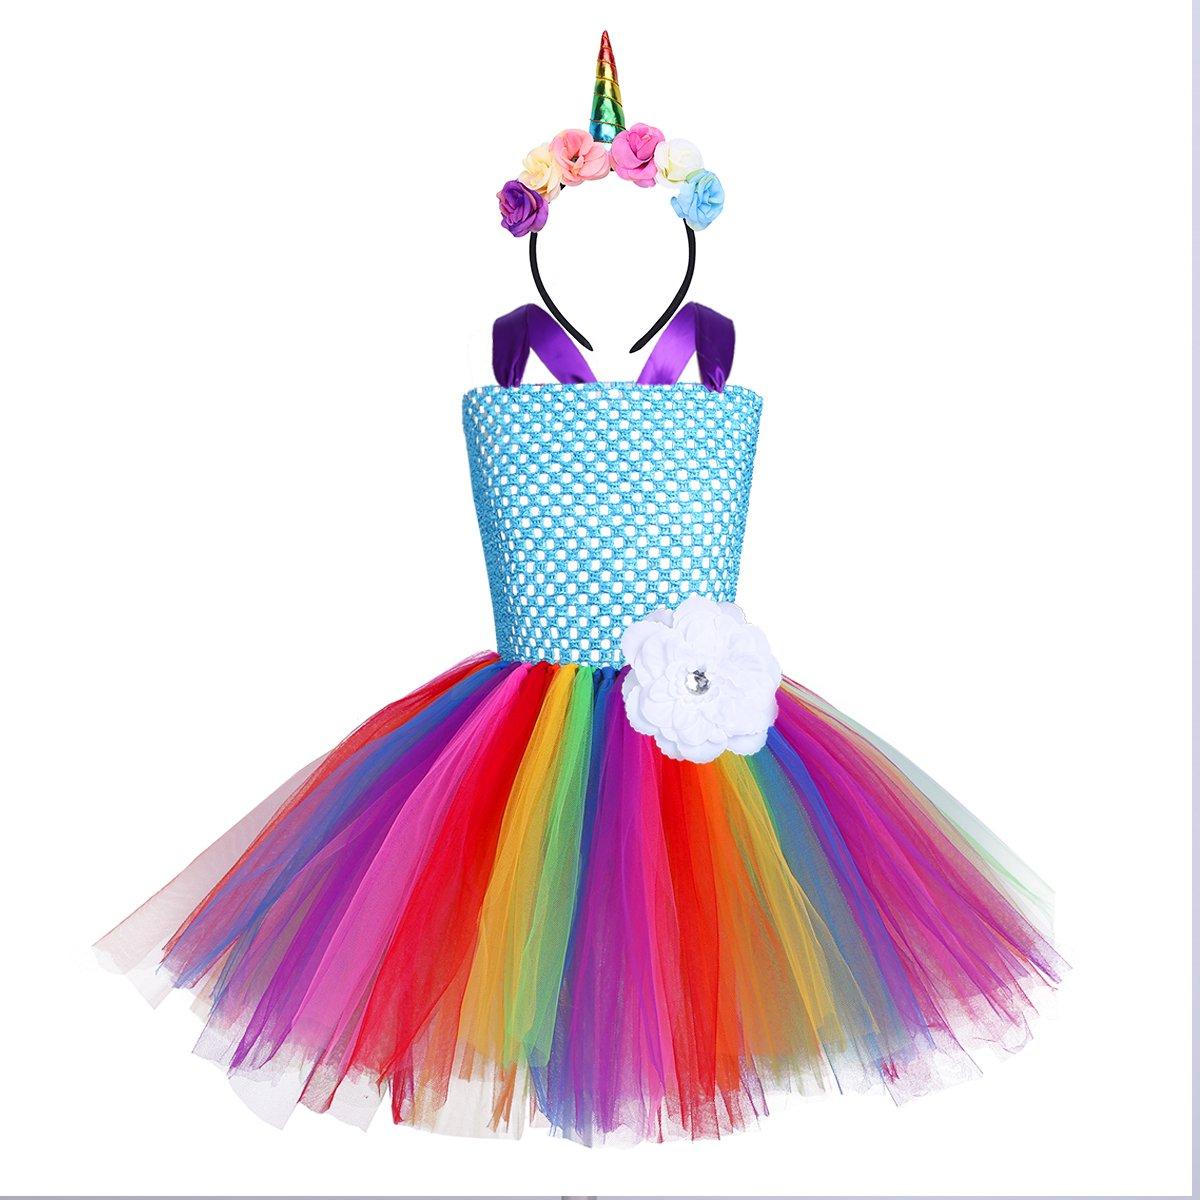 Freebily Vestido de Princesa Bautizo para Niña Vestido Infantil Fiesta Niña Diadema de Cuerno de Unicornio